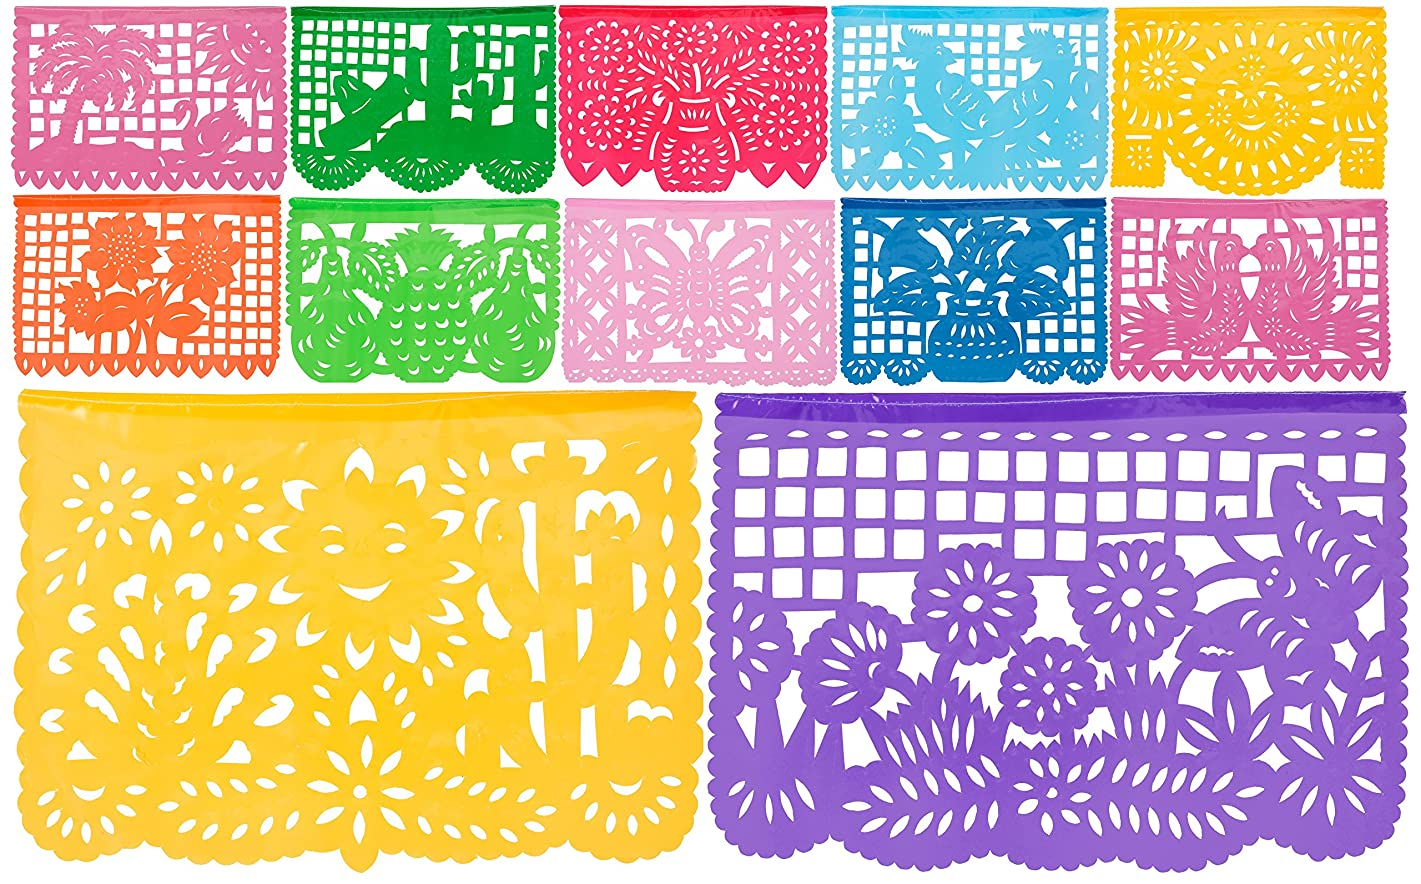 Plastic Medium Mexican Papel Picado Banner - Salio El Sol - 12 Tissue Panels Multi-Colored - Designs and Colors as Pictured